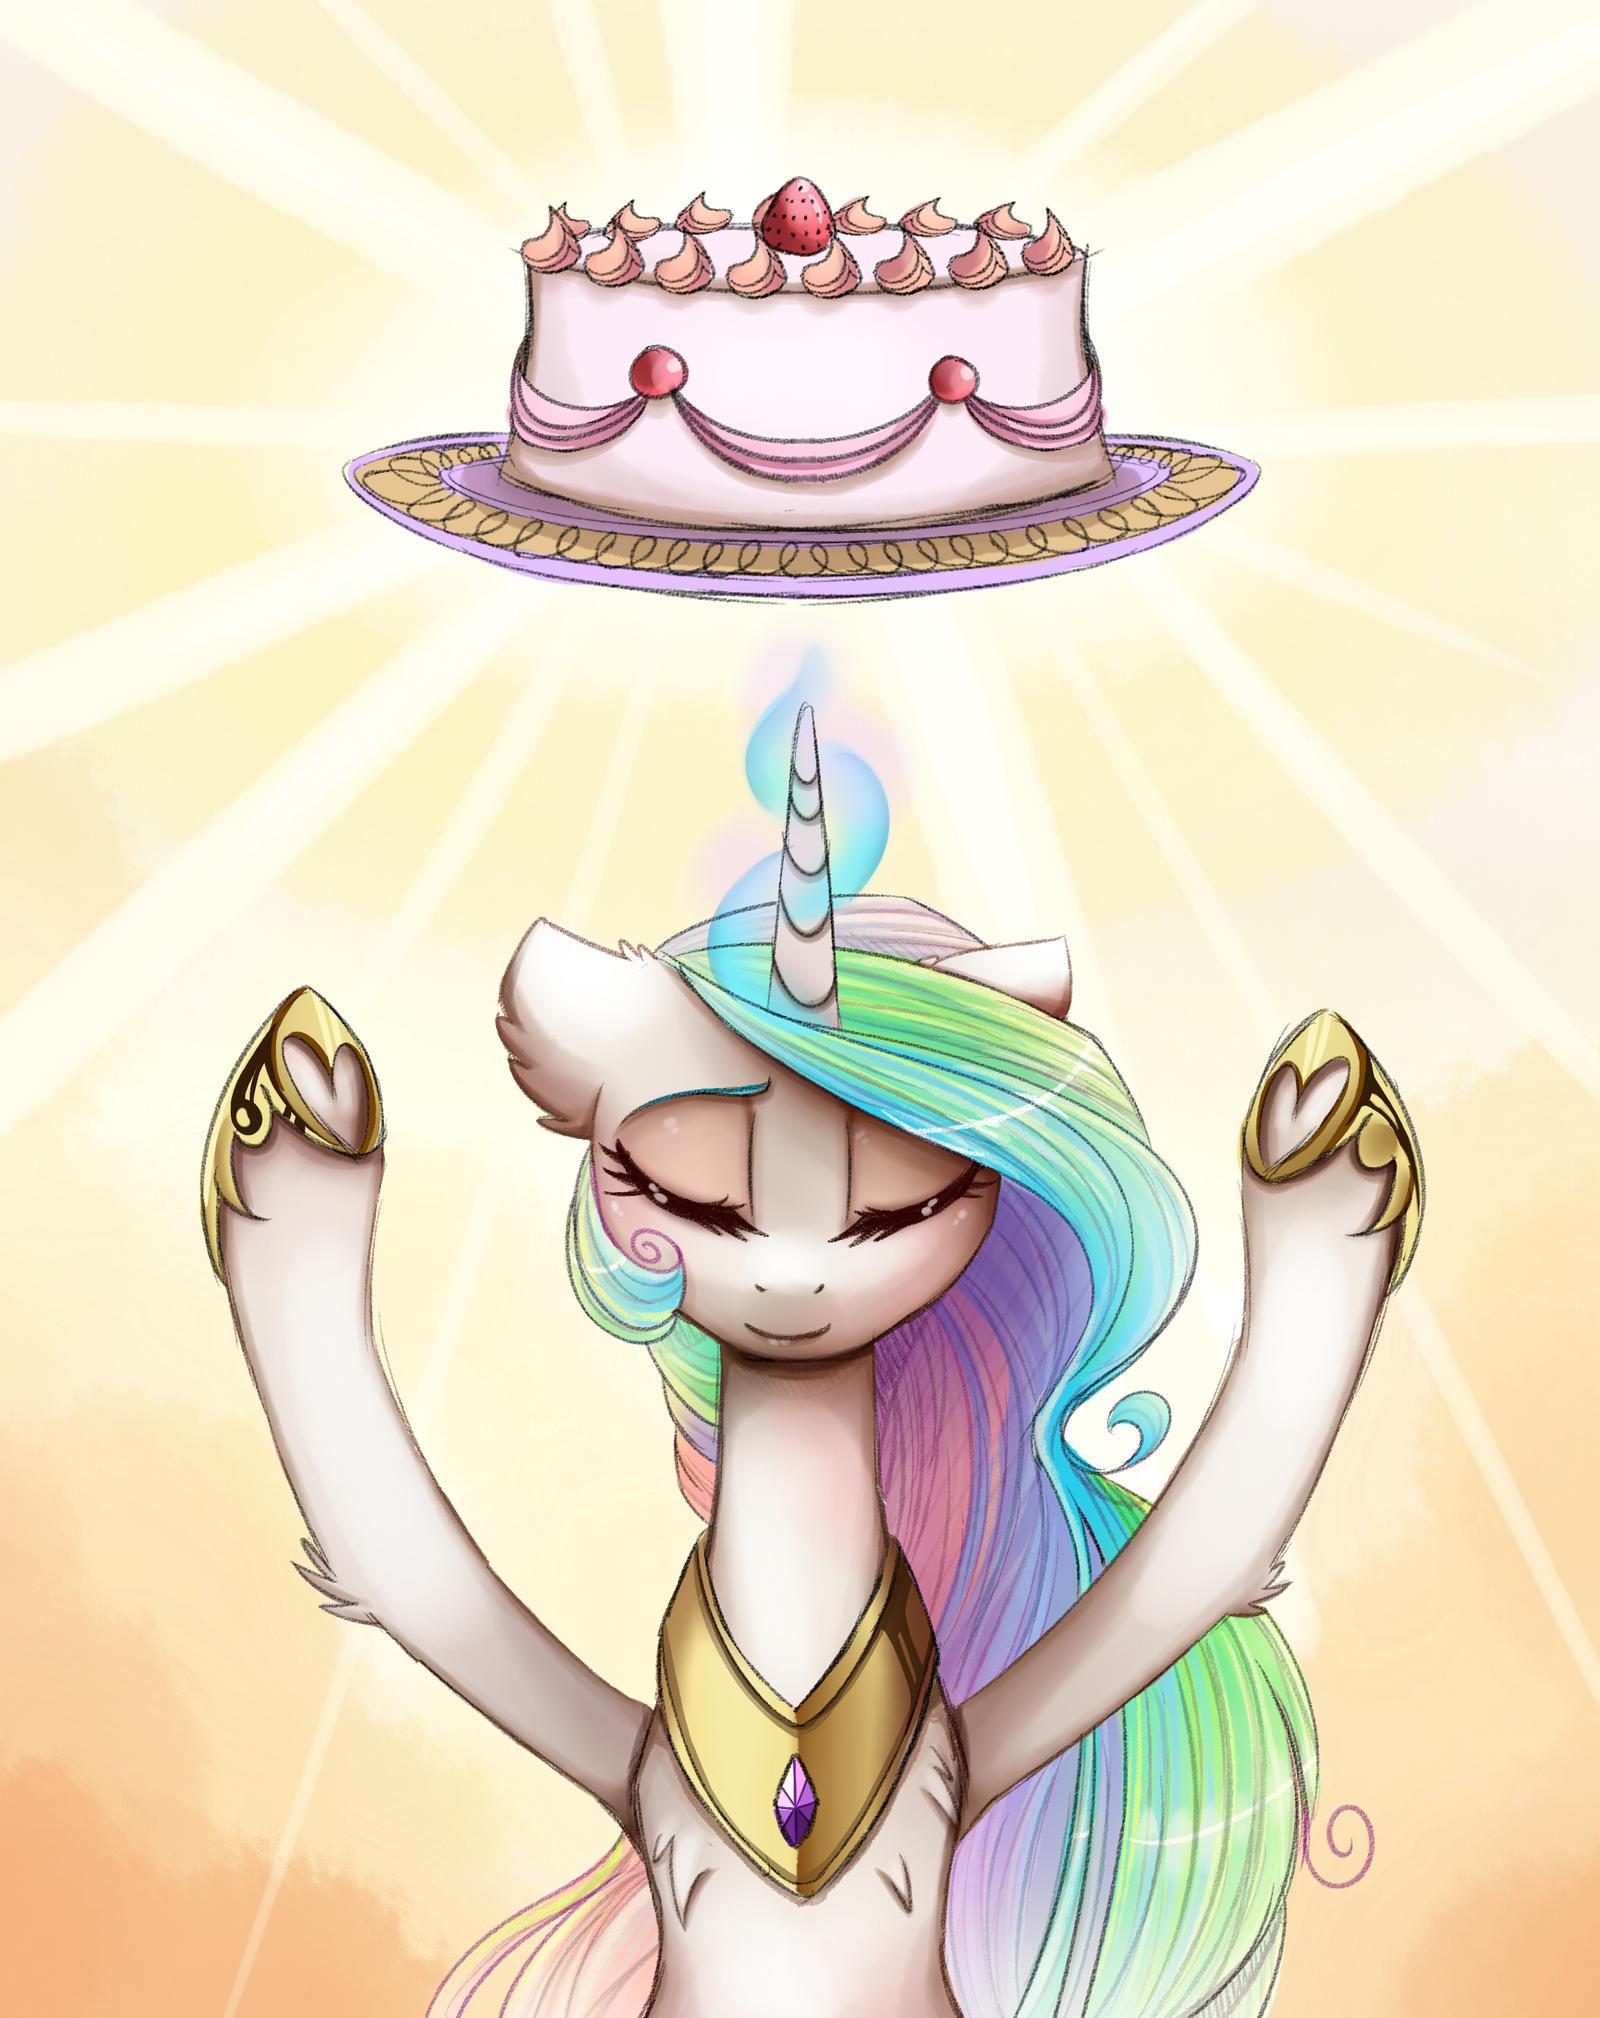 rising the cake